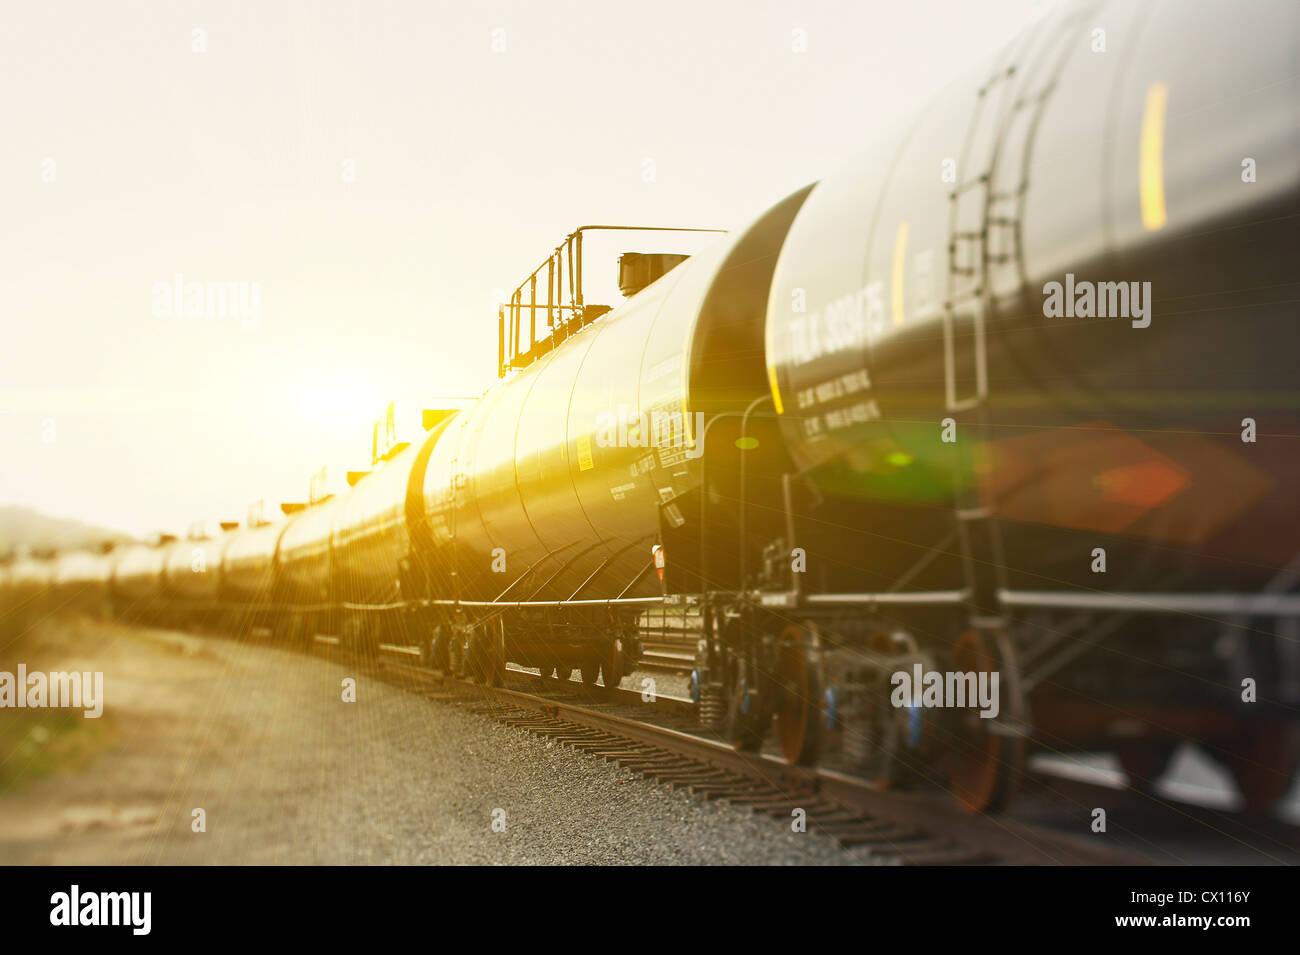 Railroad tanker cars in sunlight - Stock Image